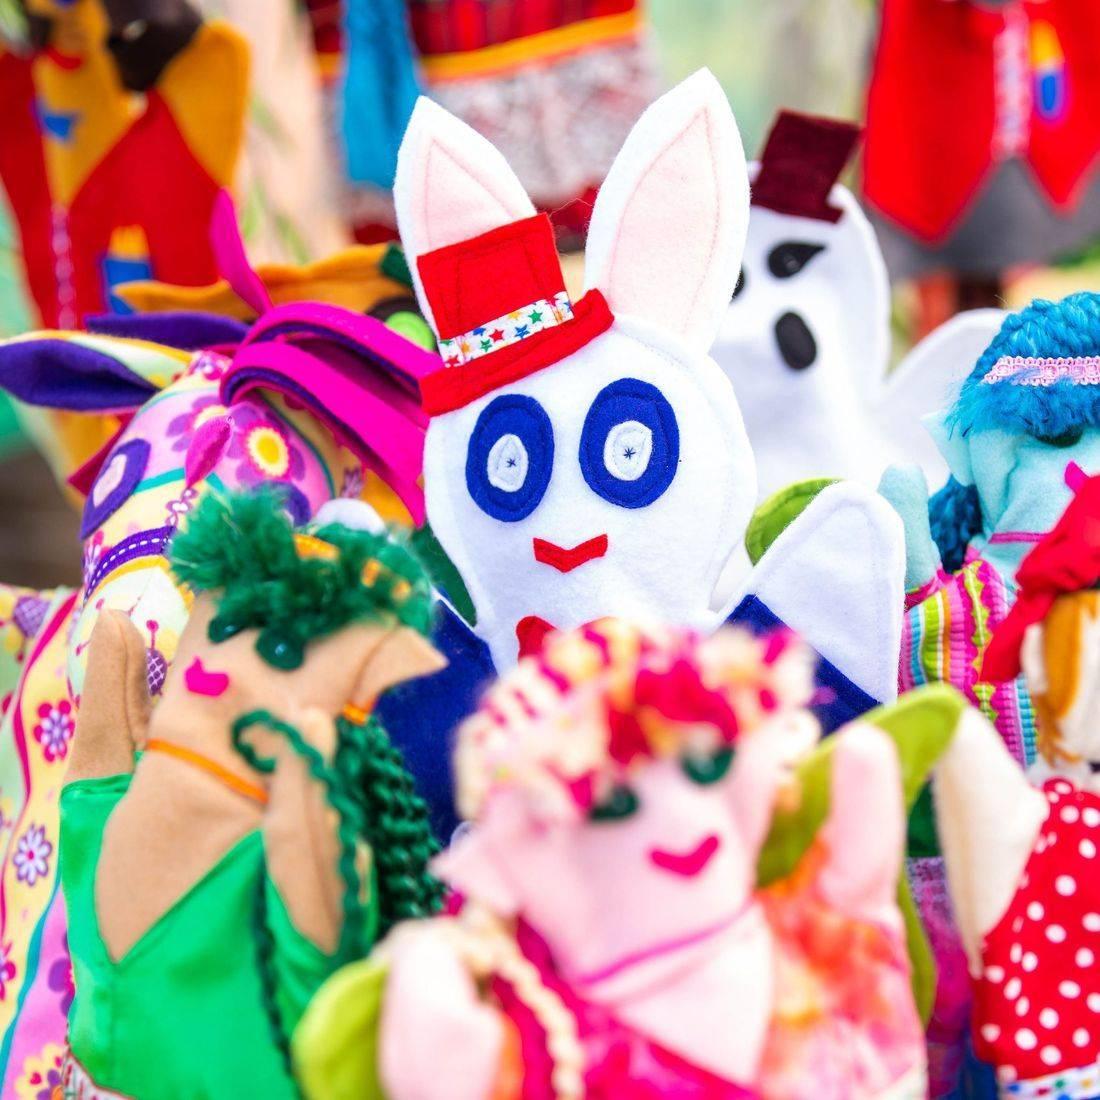 dolls, vendor, handmade dolls, crafts